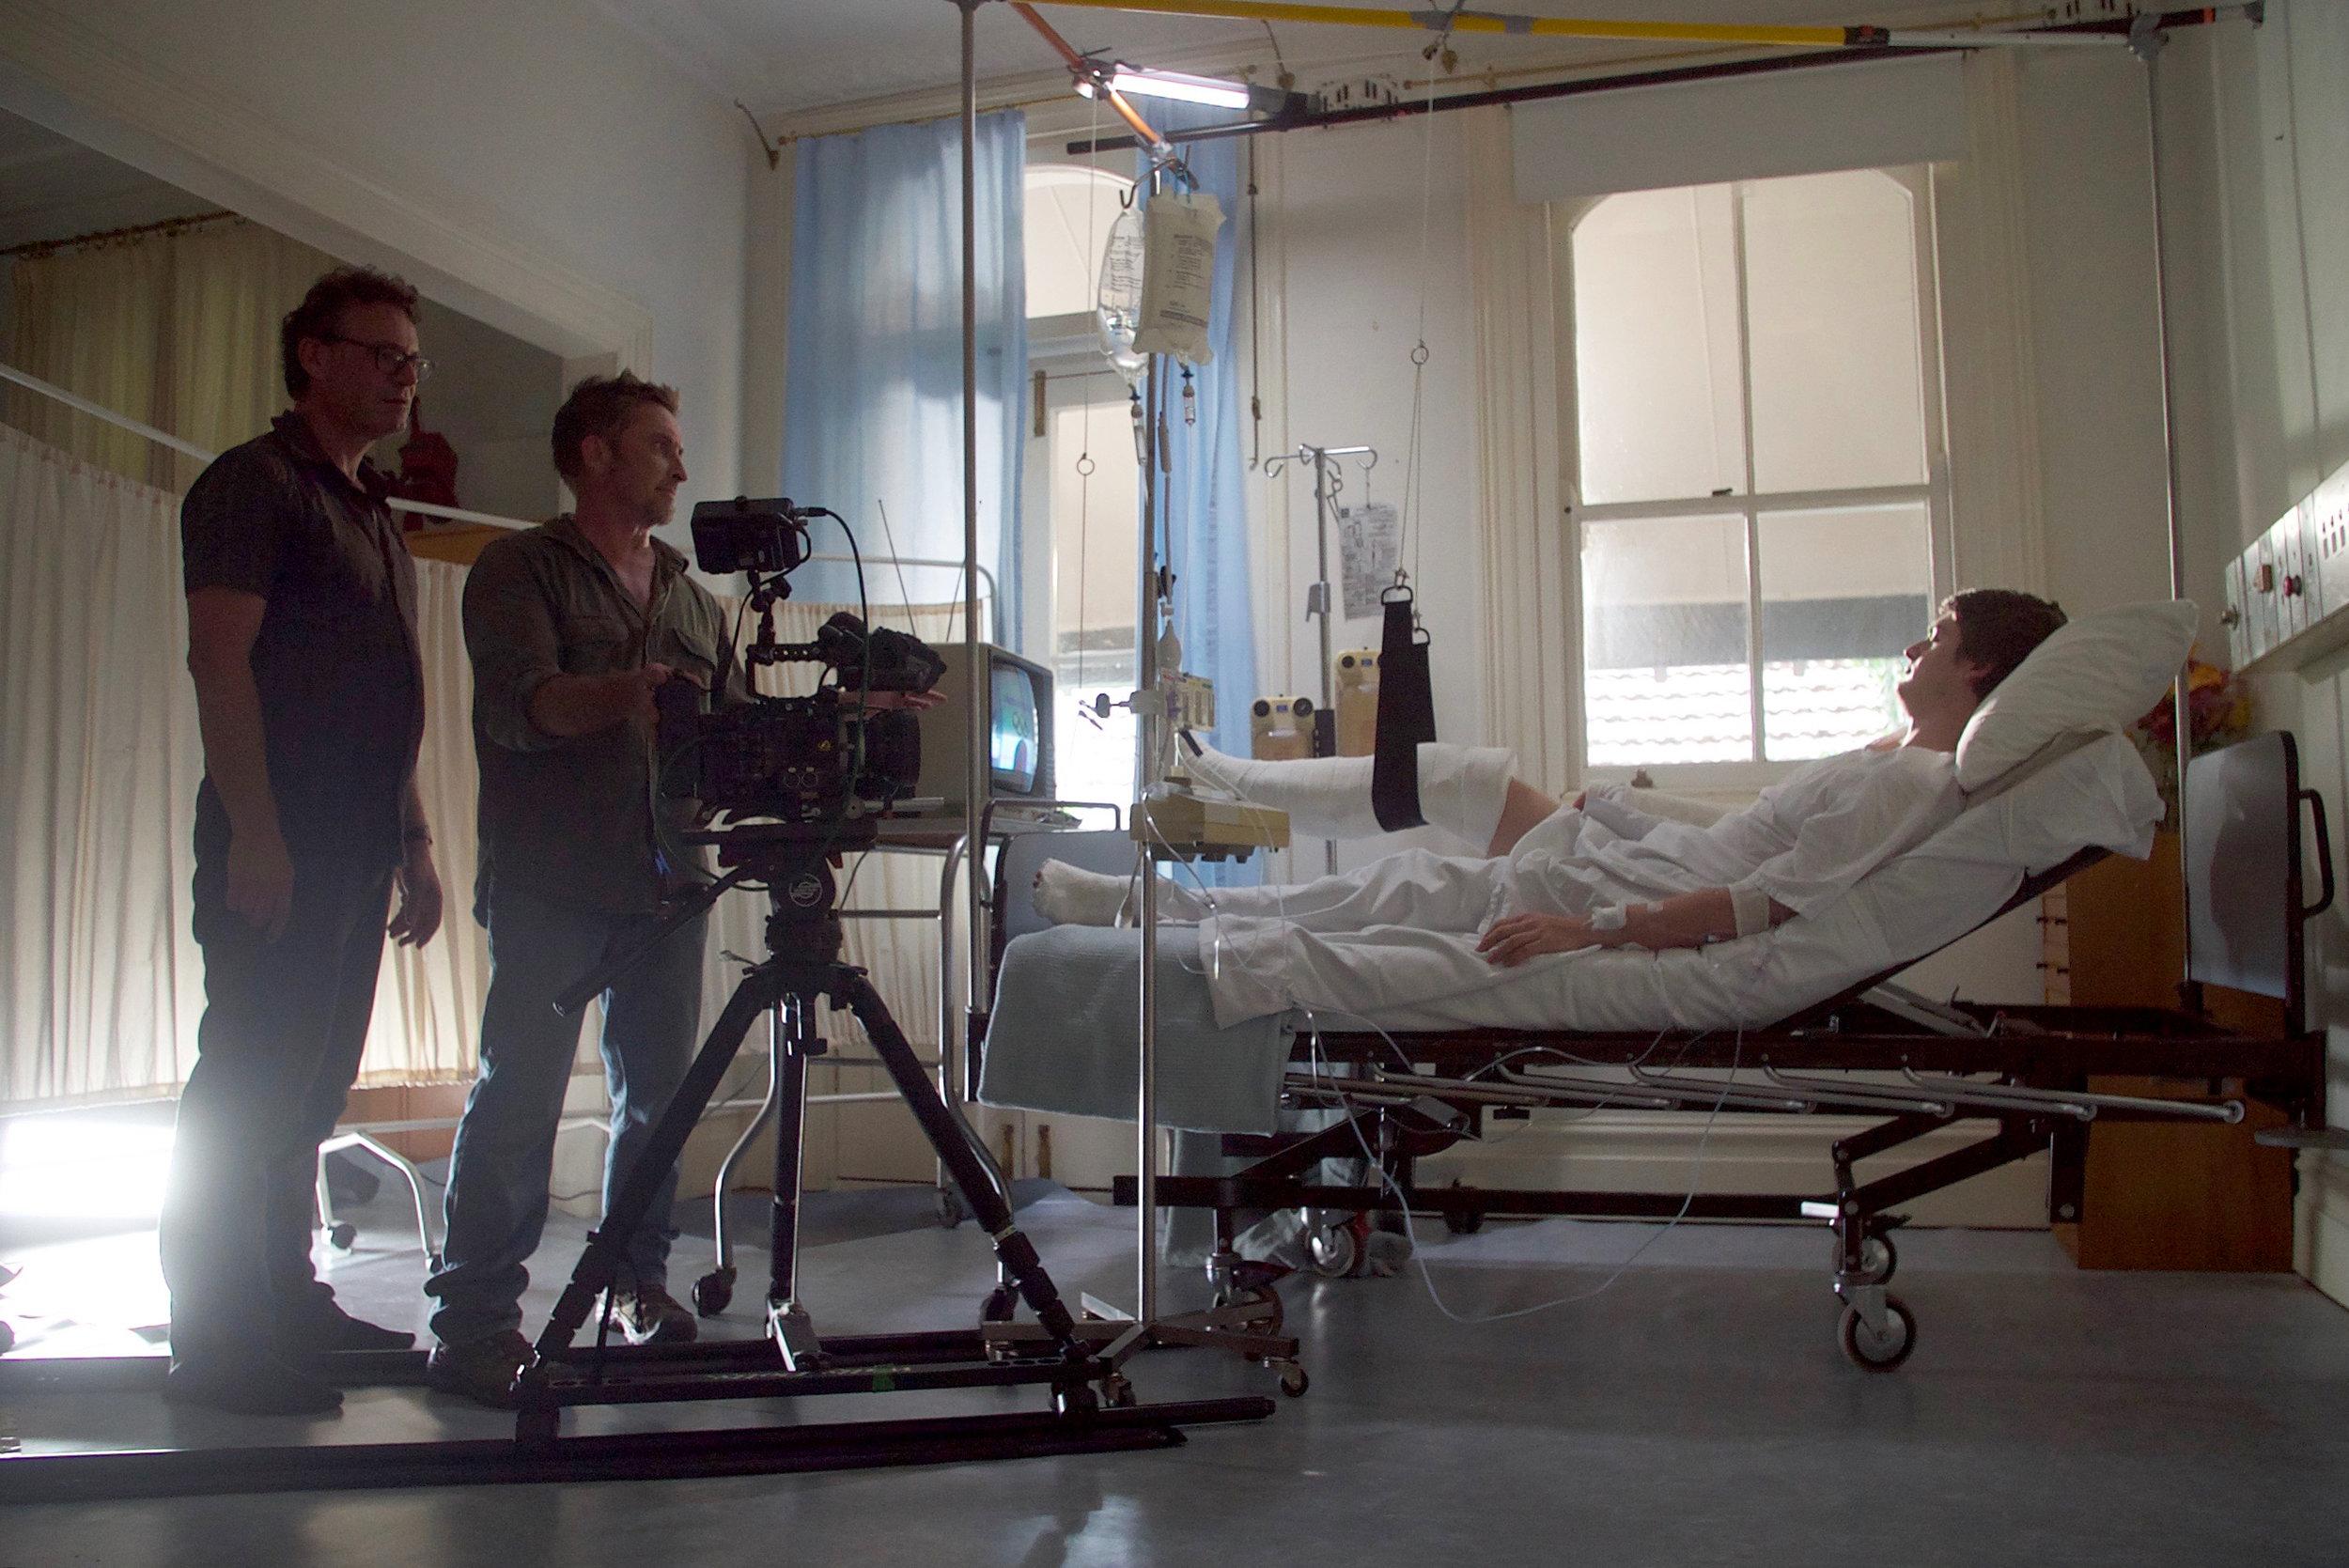 007_Own the Sky_Film Crew_©OTS Films.jpg